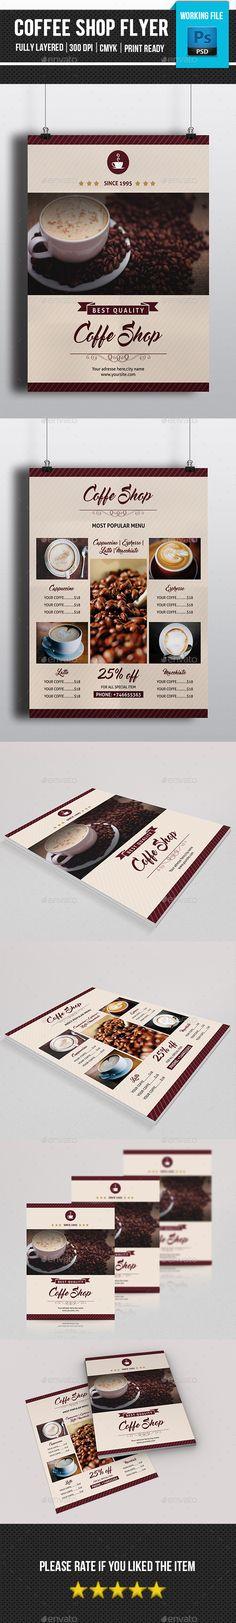 Minimal Coffee Shop #Flyer-V138 - #Food Menus Print #Templates Download here: https://graphicriver.net/item/minimal-coffee-shop-flyerv138/19495278?ref=alena994